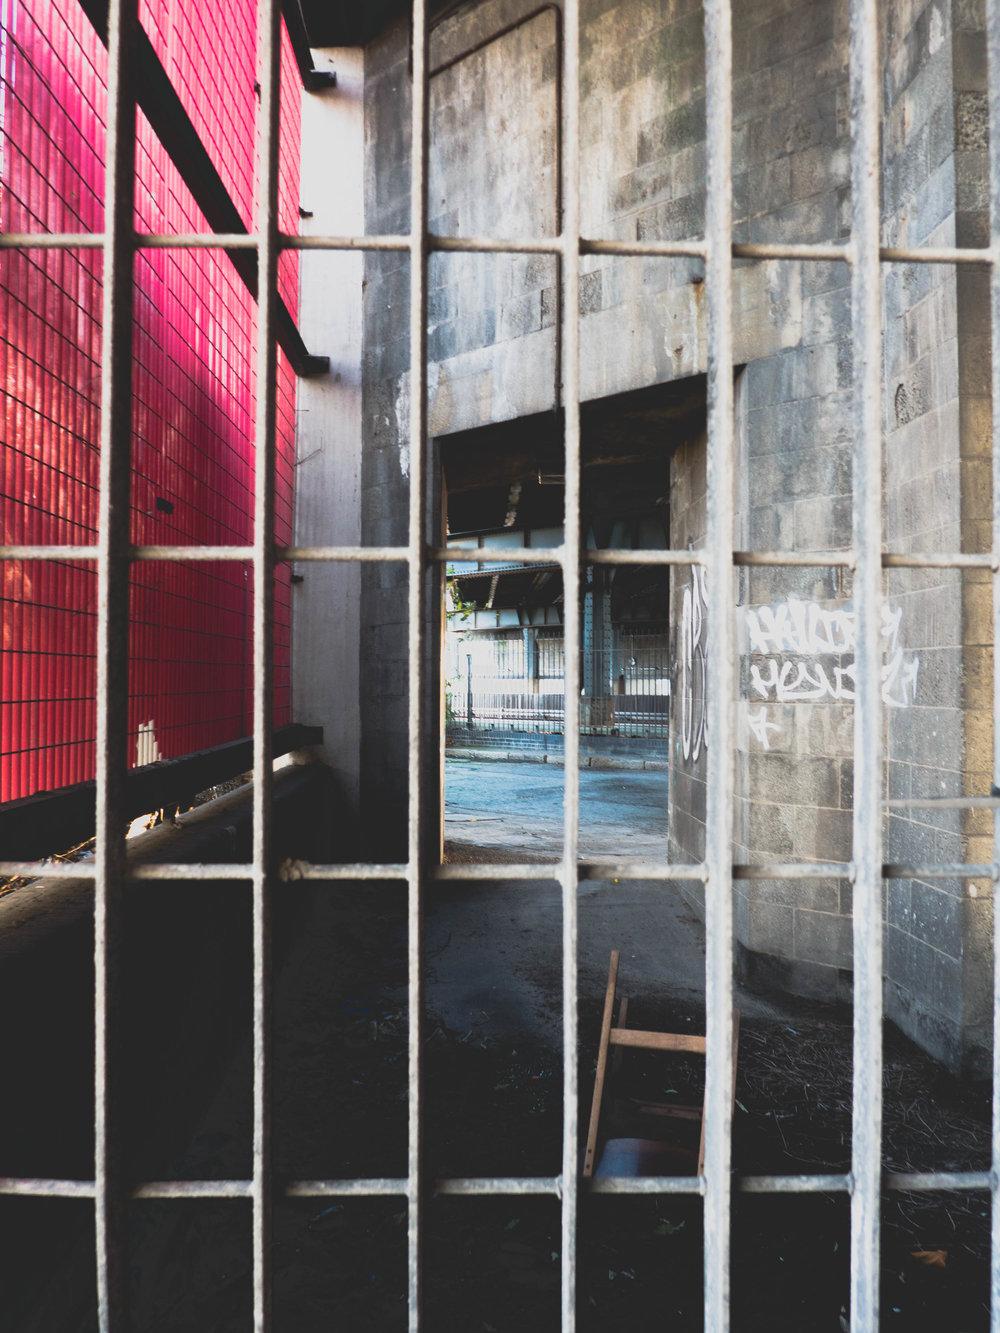 street photography 140118 - 1.jpg